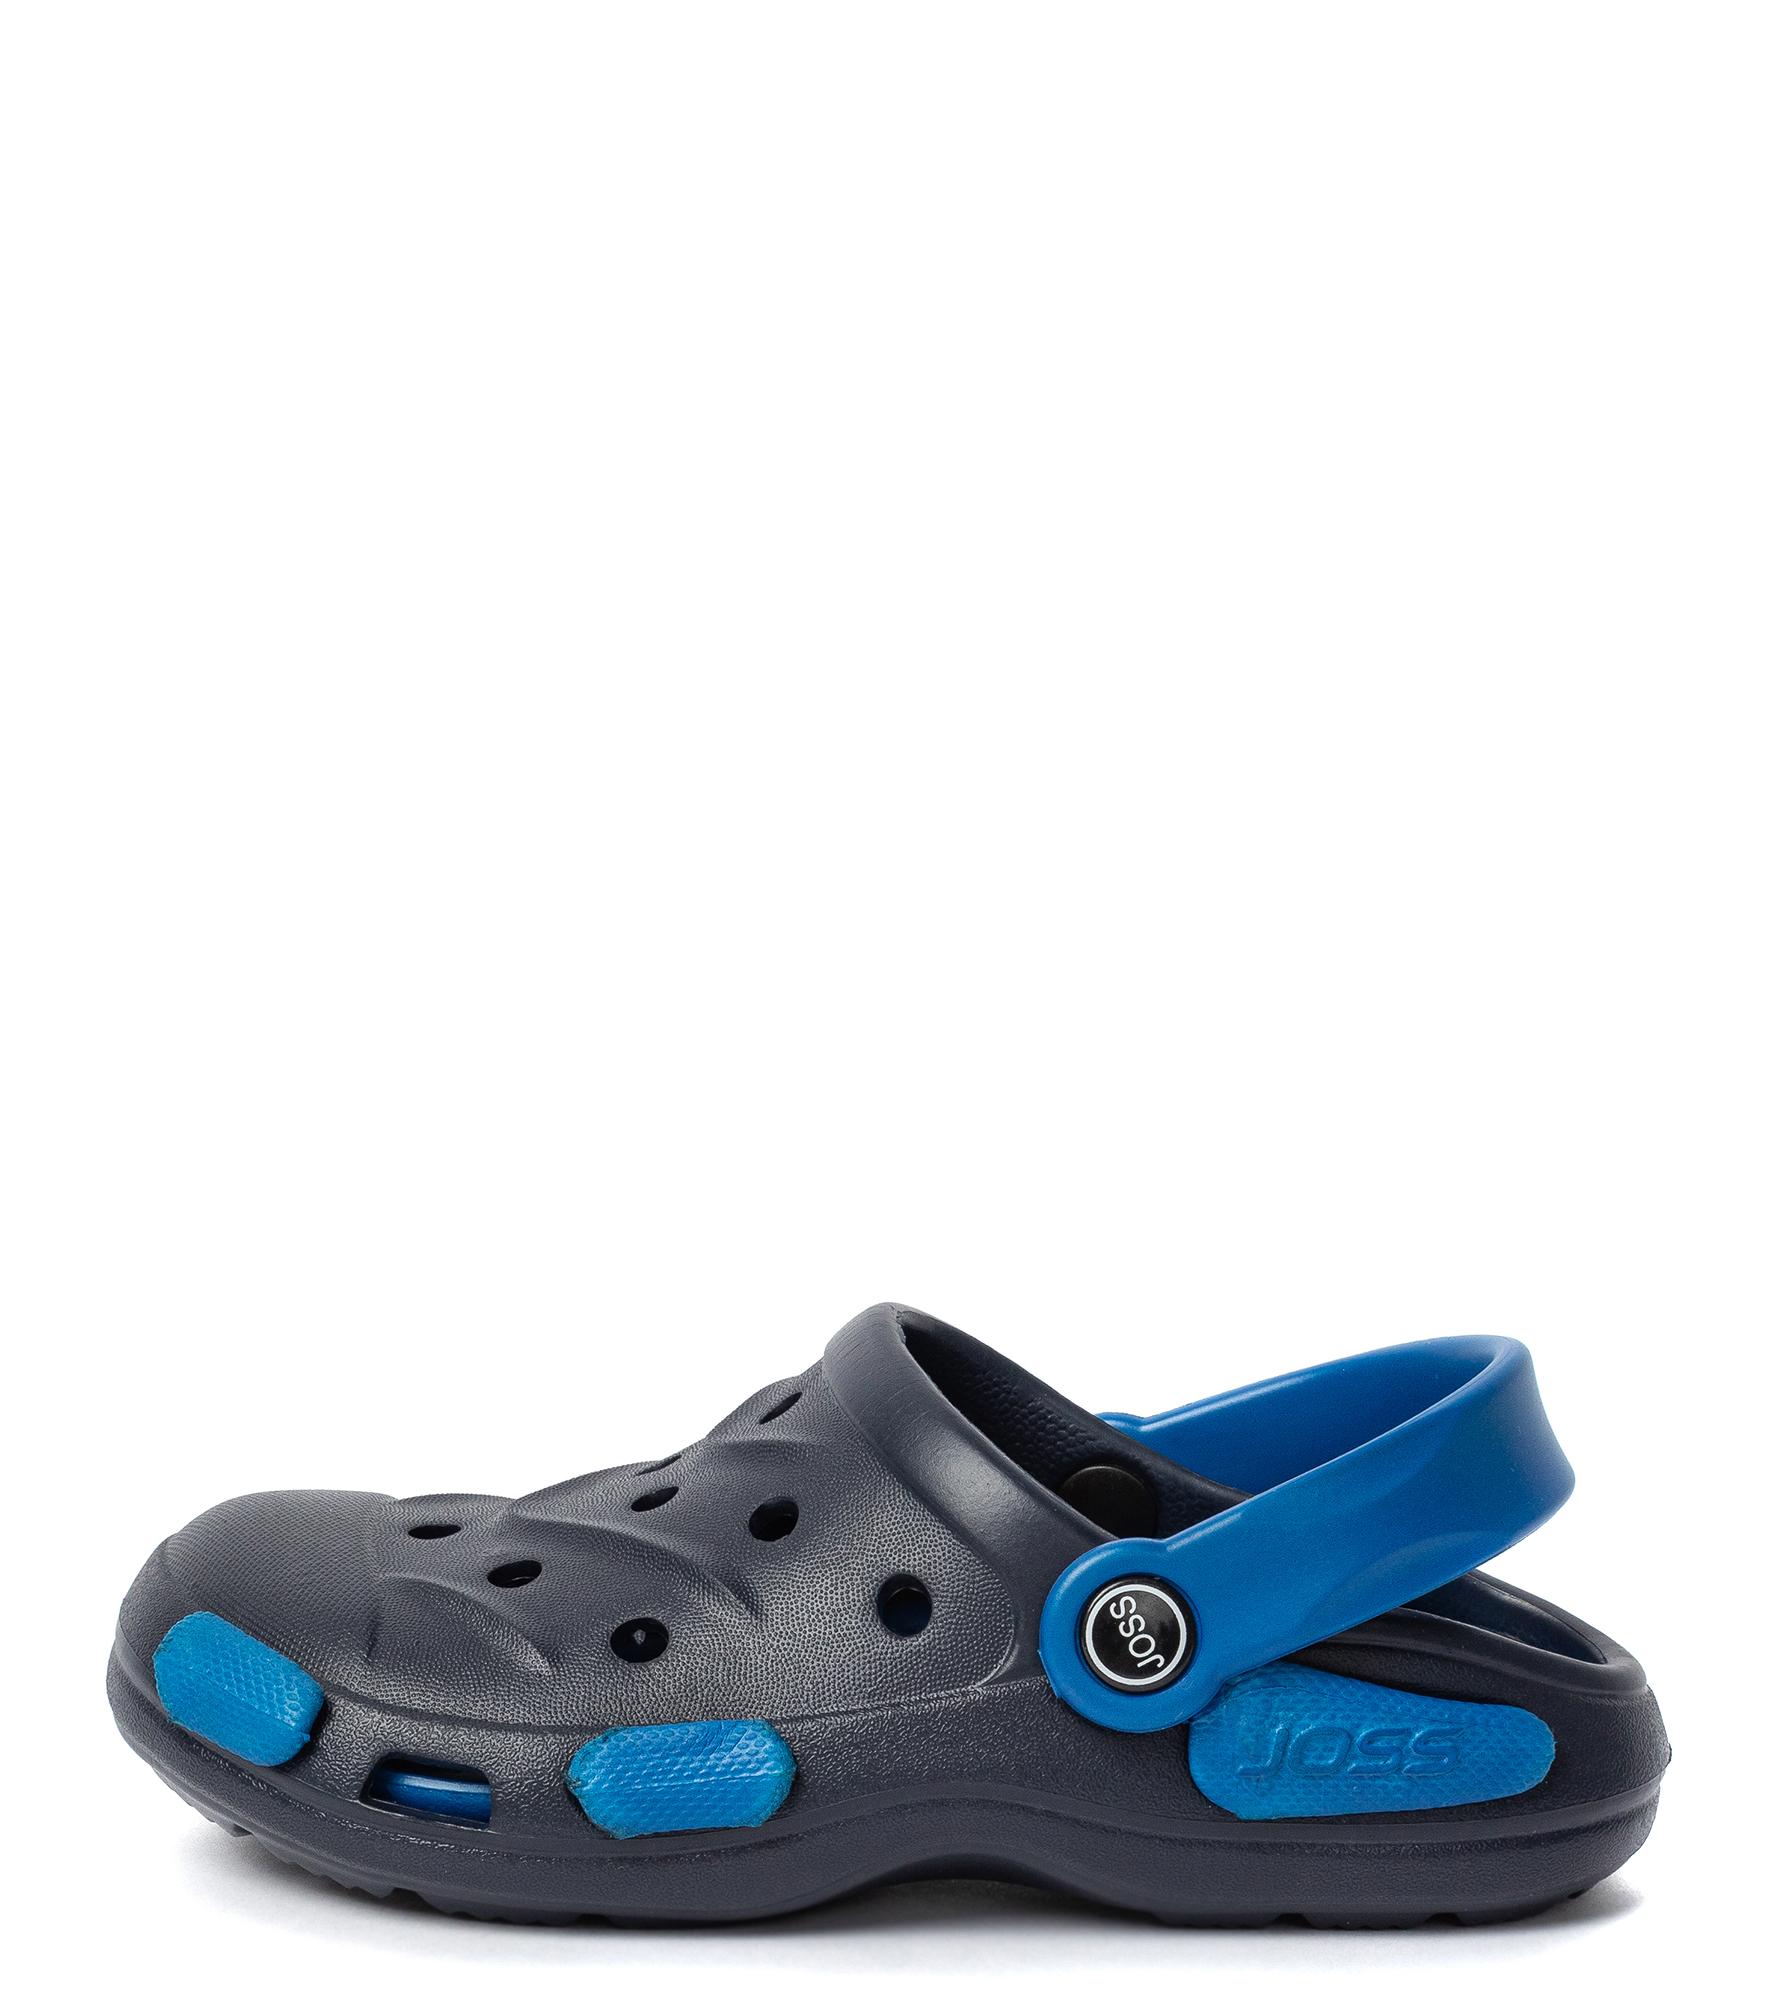 цена на Joss Шлепанцы для мальчиков Joss Garden Shoes, размер 28-29